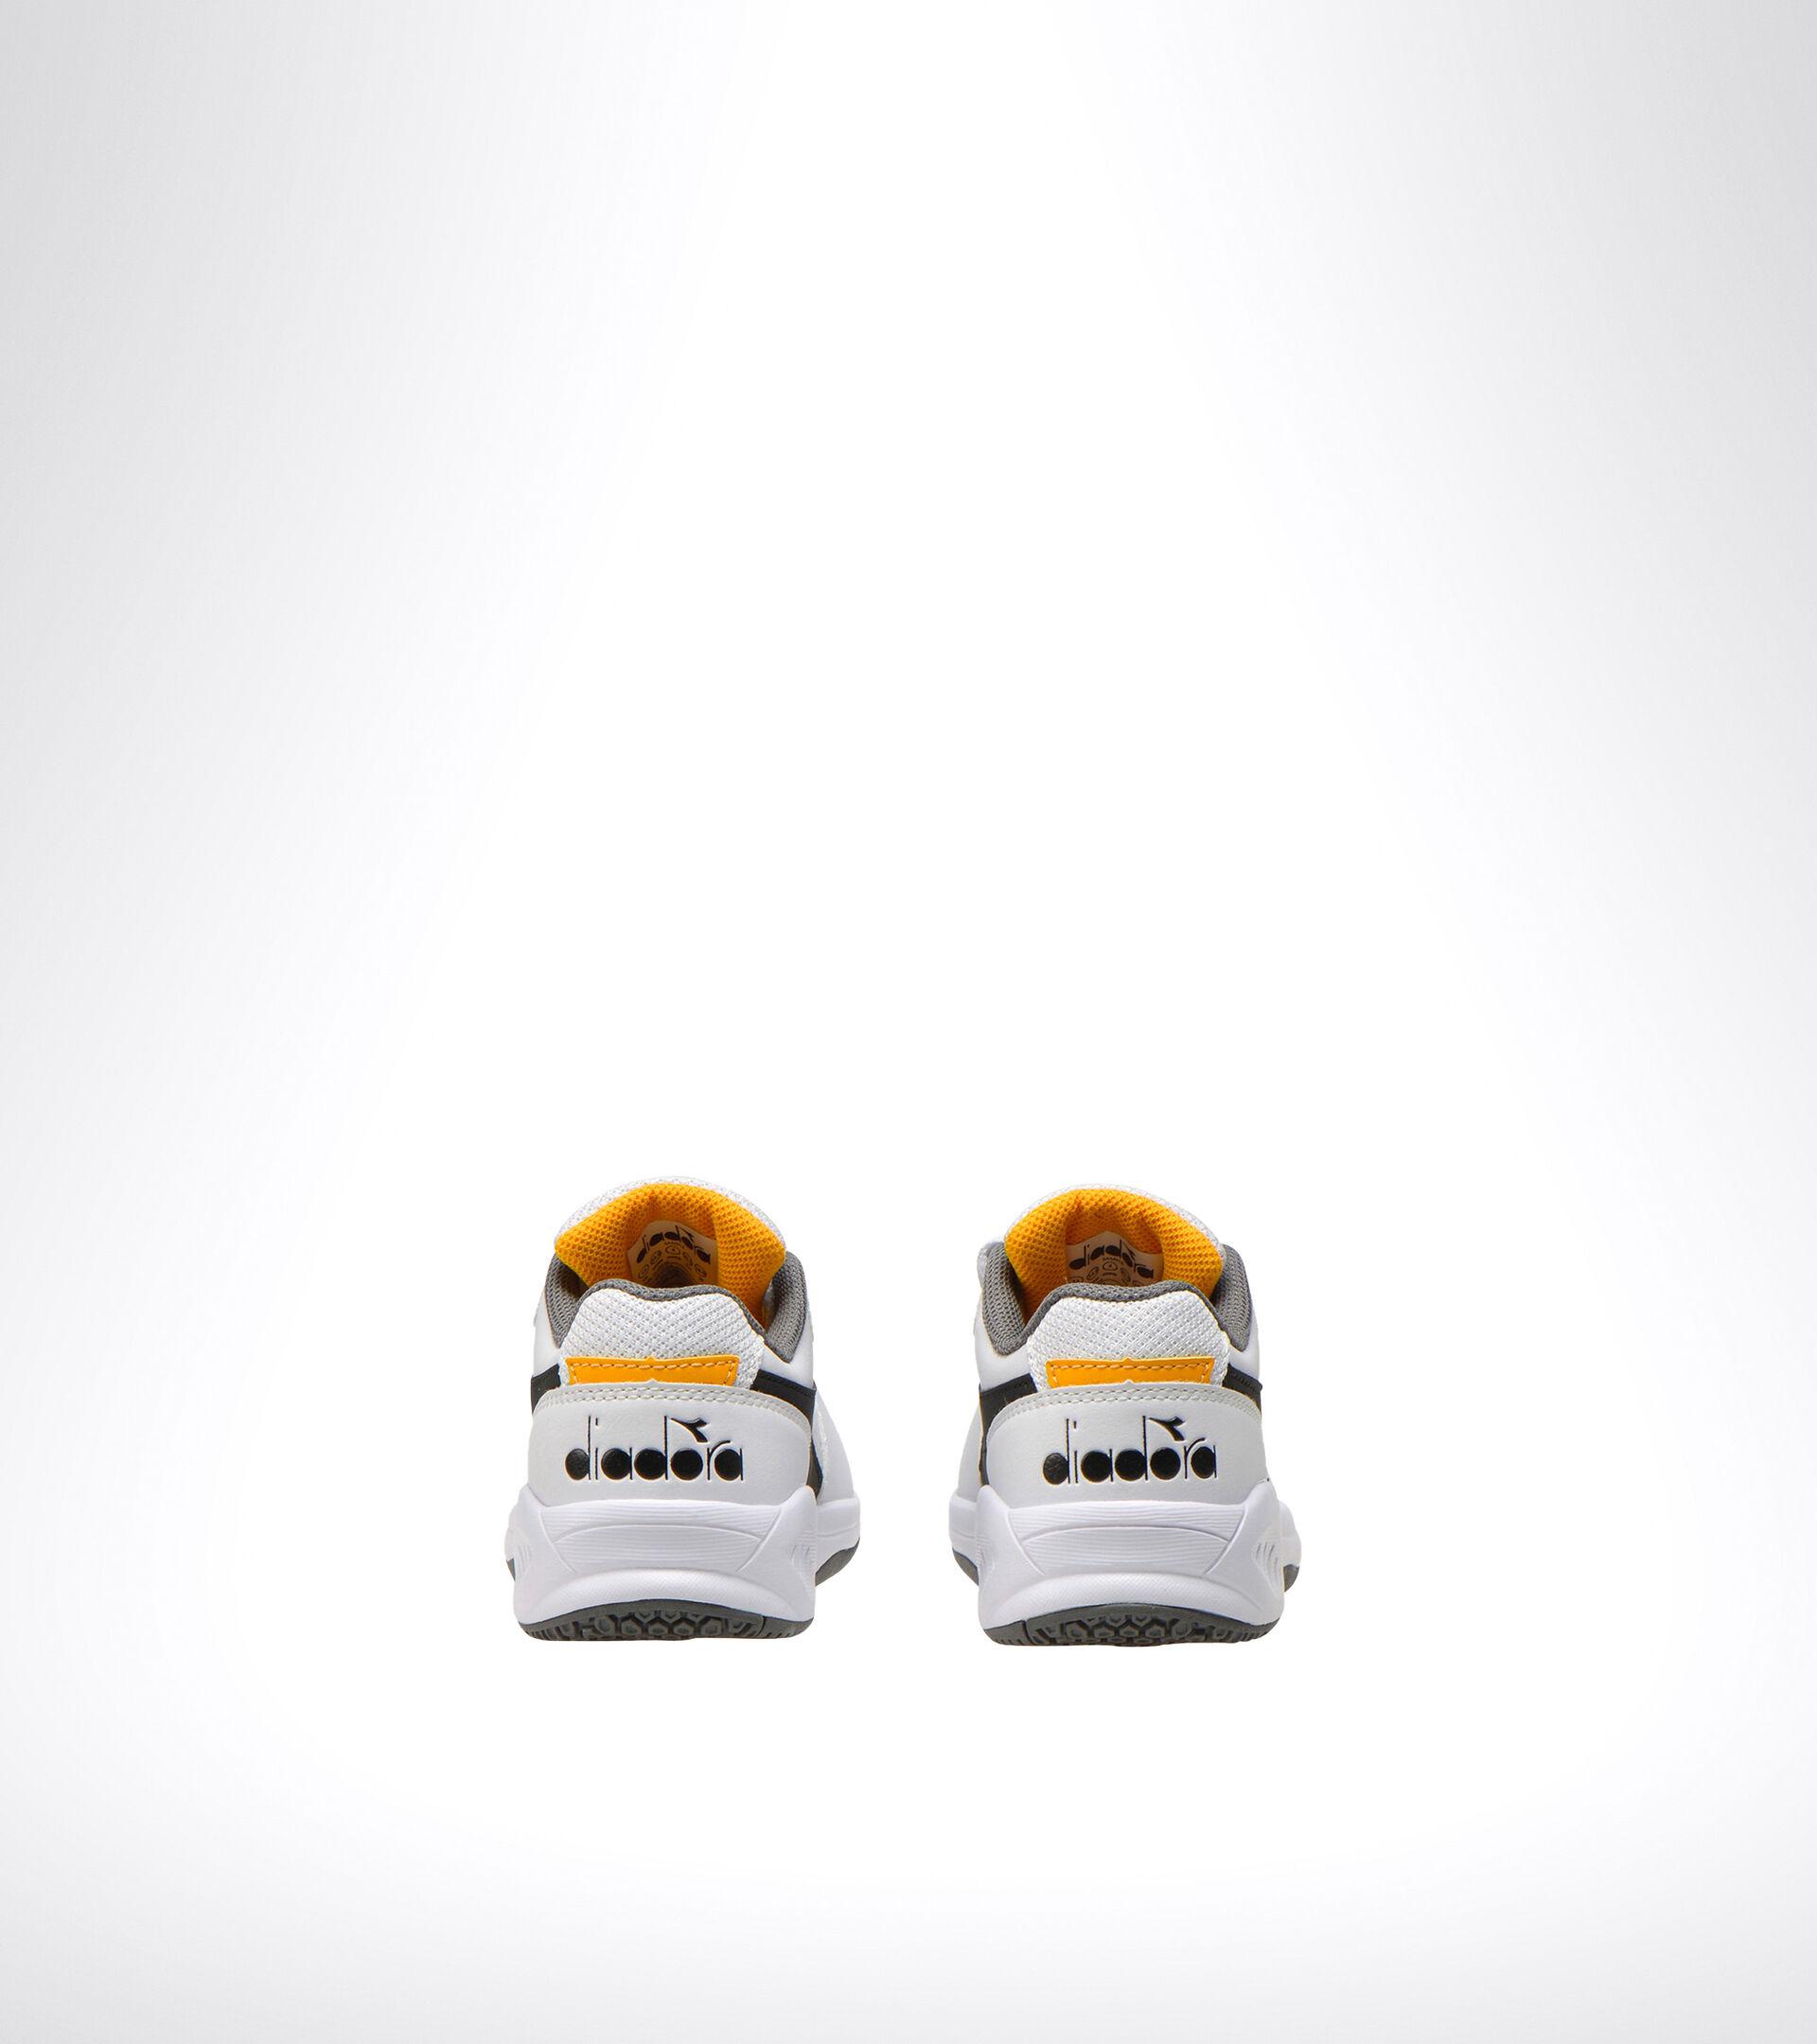 Footwear Sport BAMBINO S. CHALLENGE 3 SL JR BIANCO/NERO/GIALLO ZAFFERANO Diadora